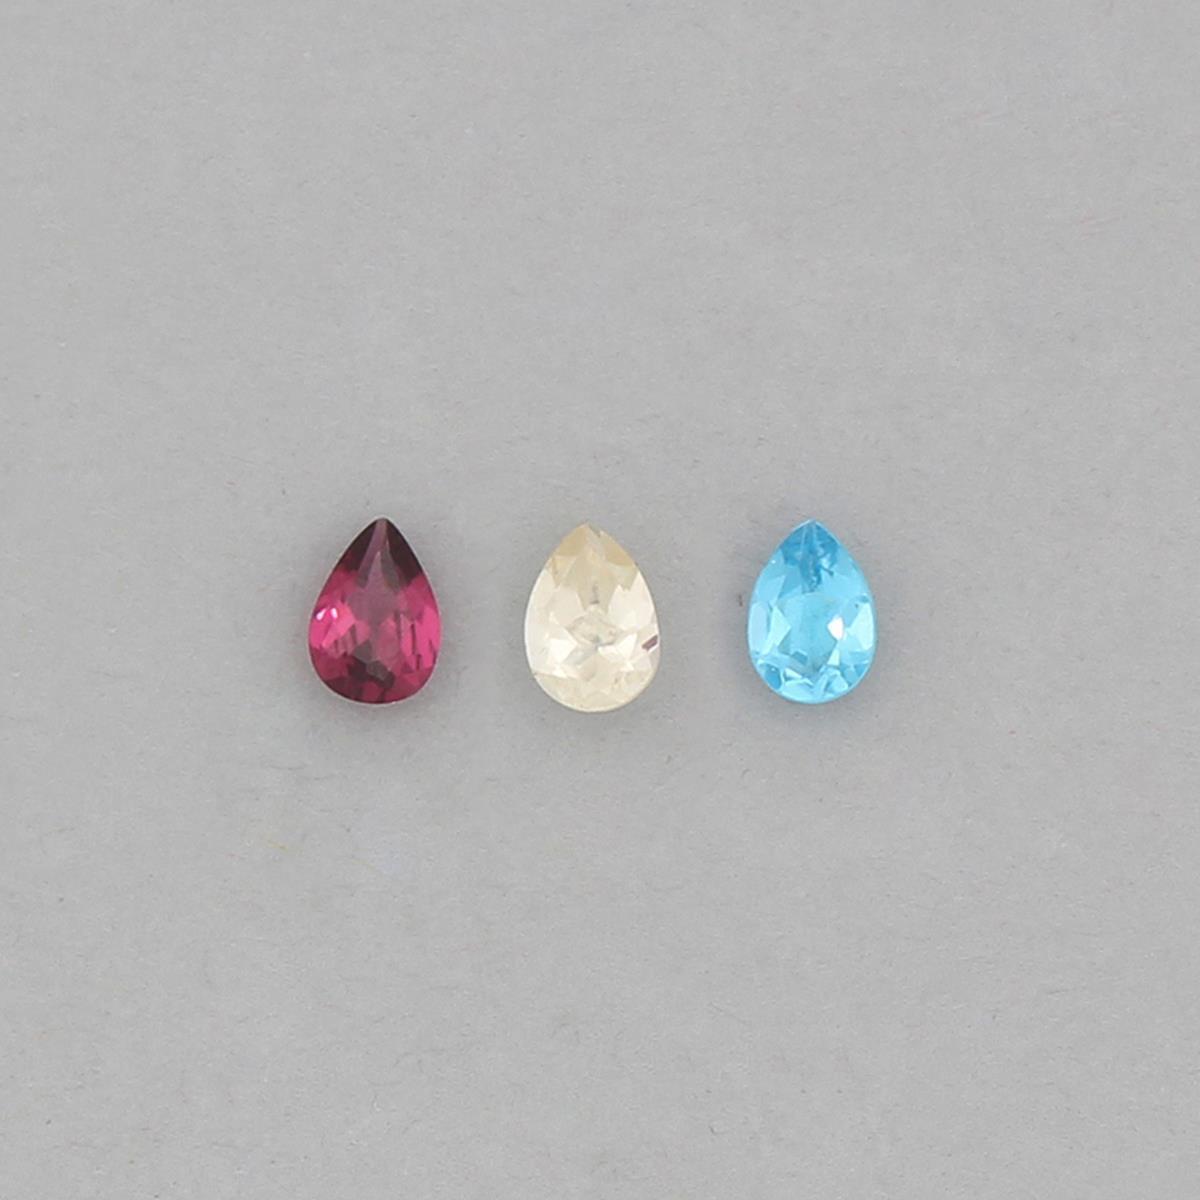 7x5mm Pear Cut Gemstone Collection